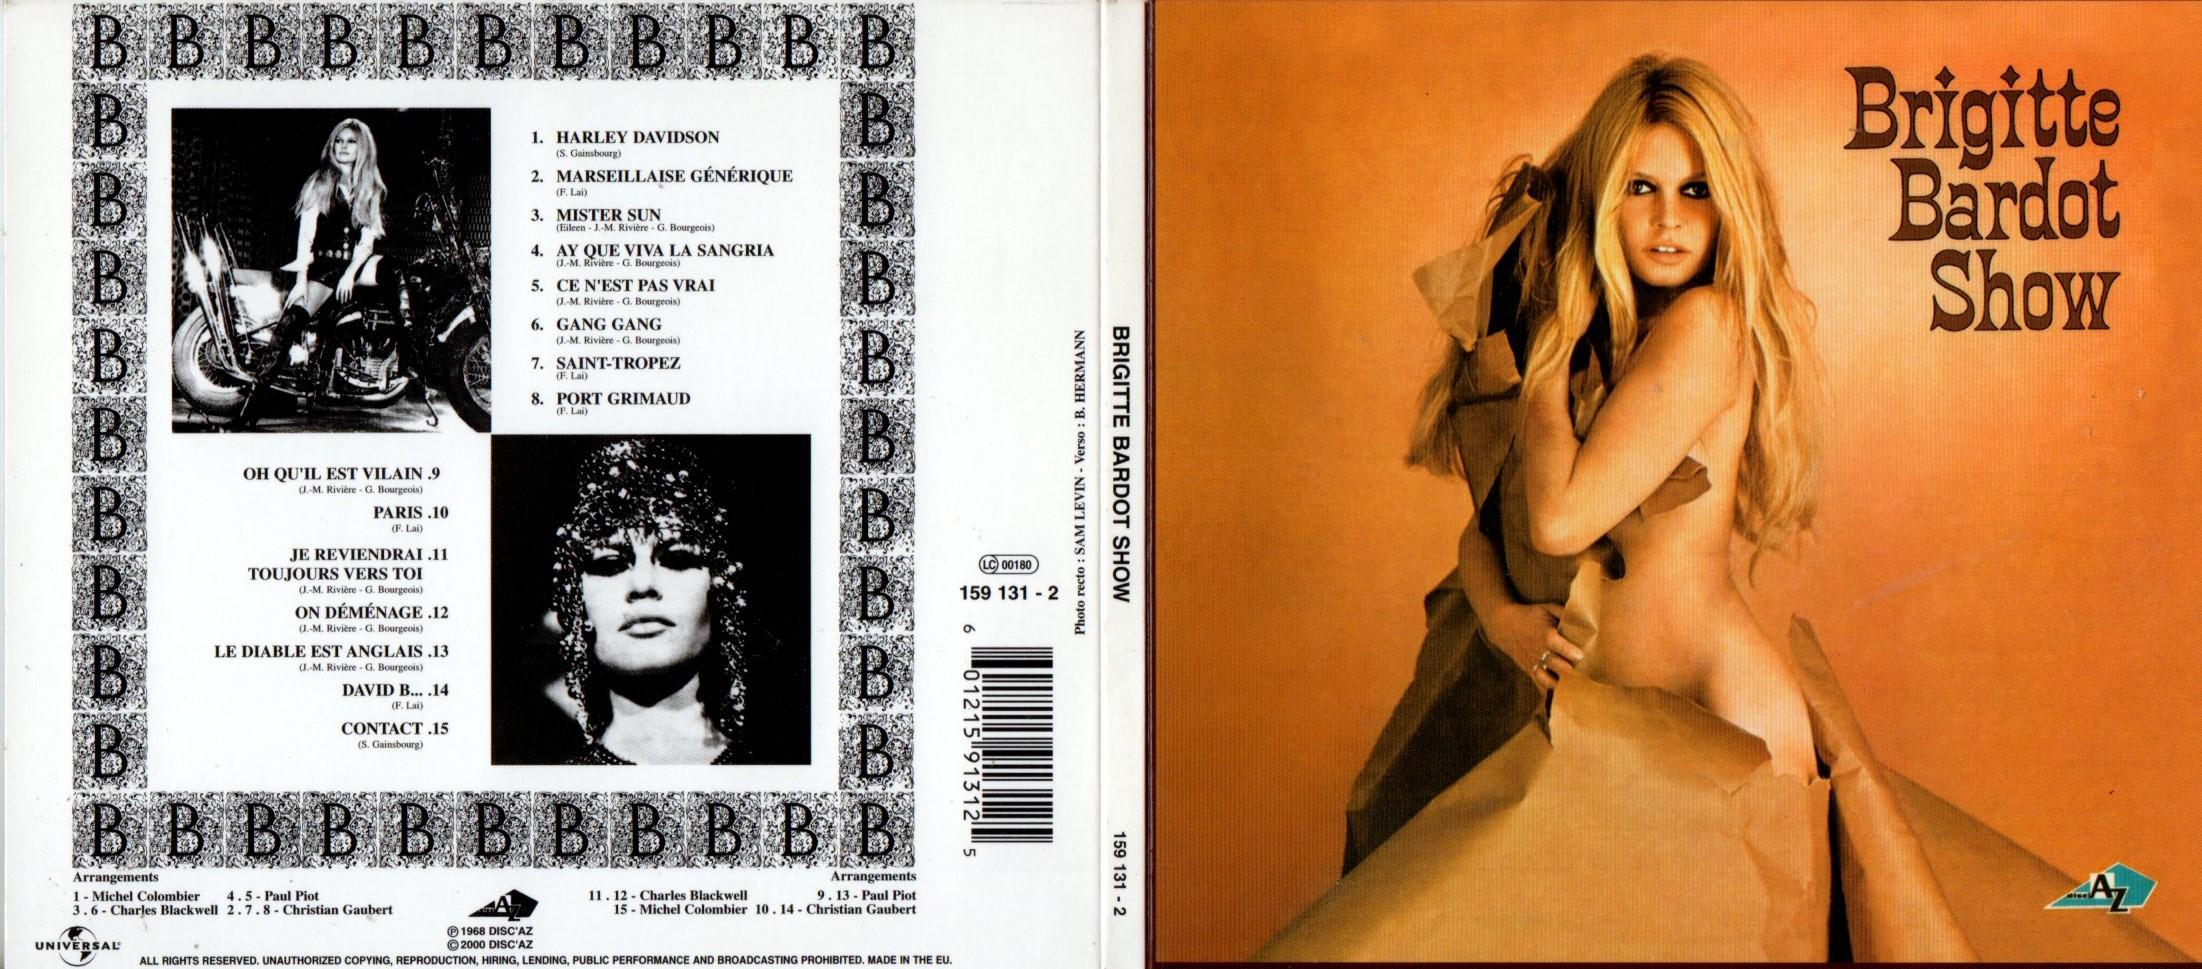 BRIGITTE BARDOT - Show Ltd Edition Digipack - CD